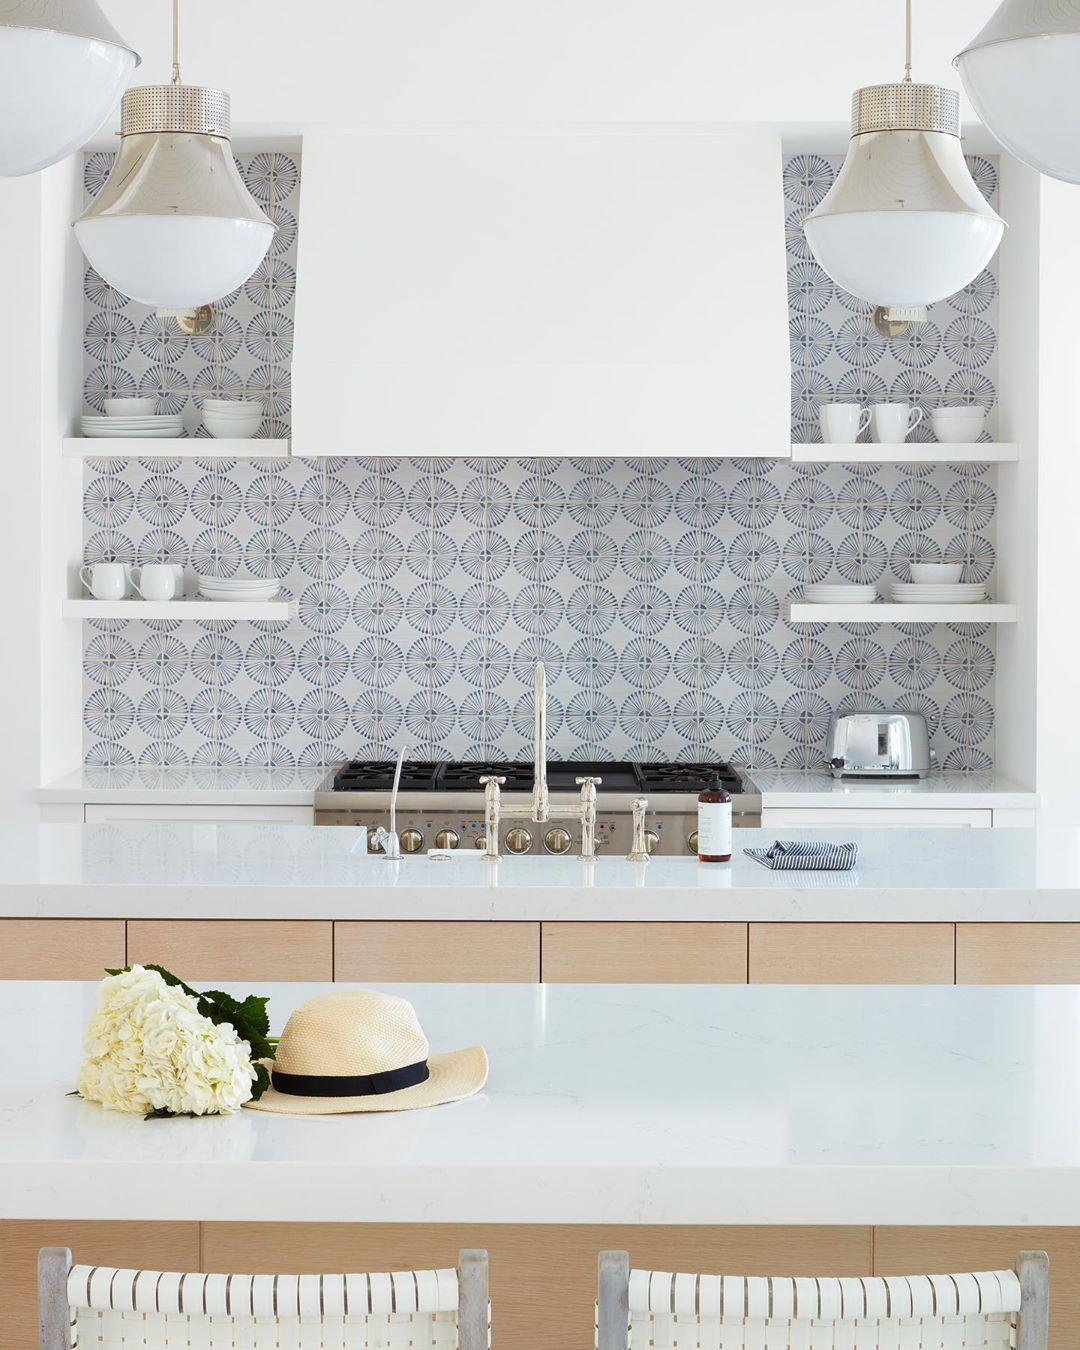 - 17 Coastal Kitchens & Decor Ideas For A Beach Or Summer Home